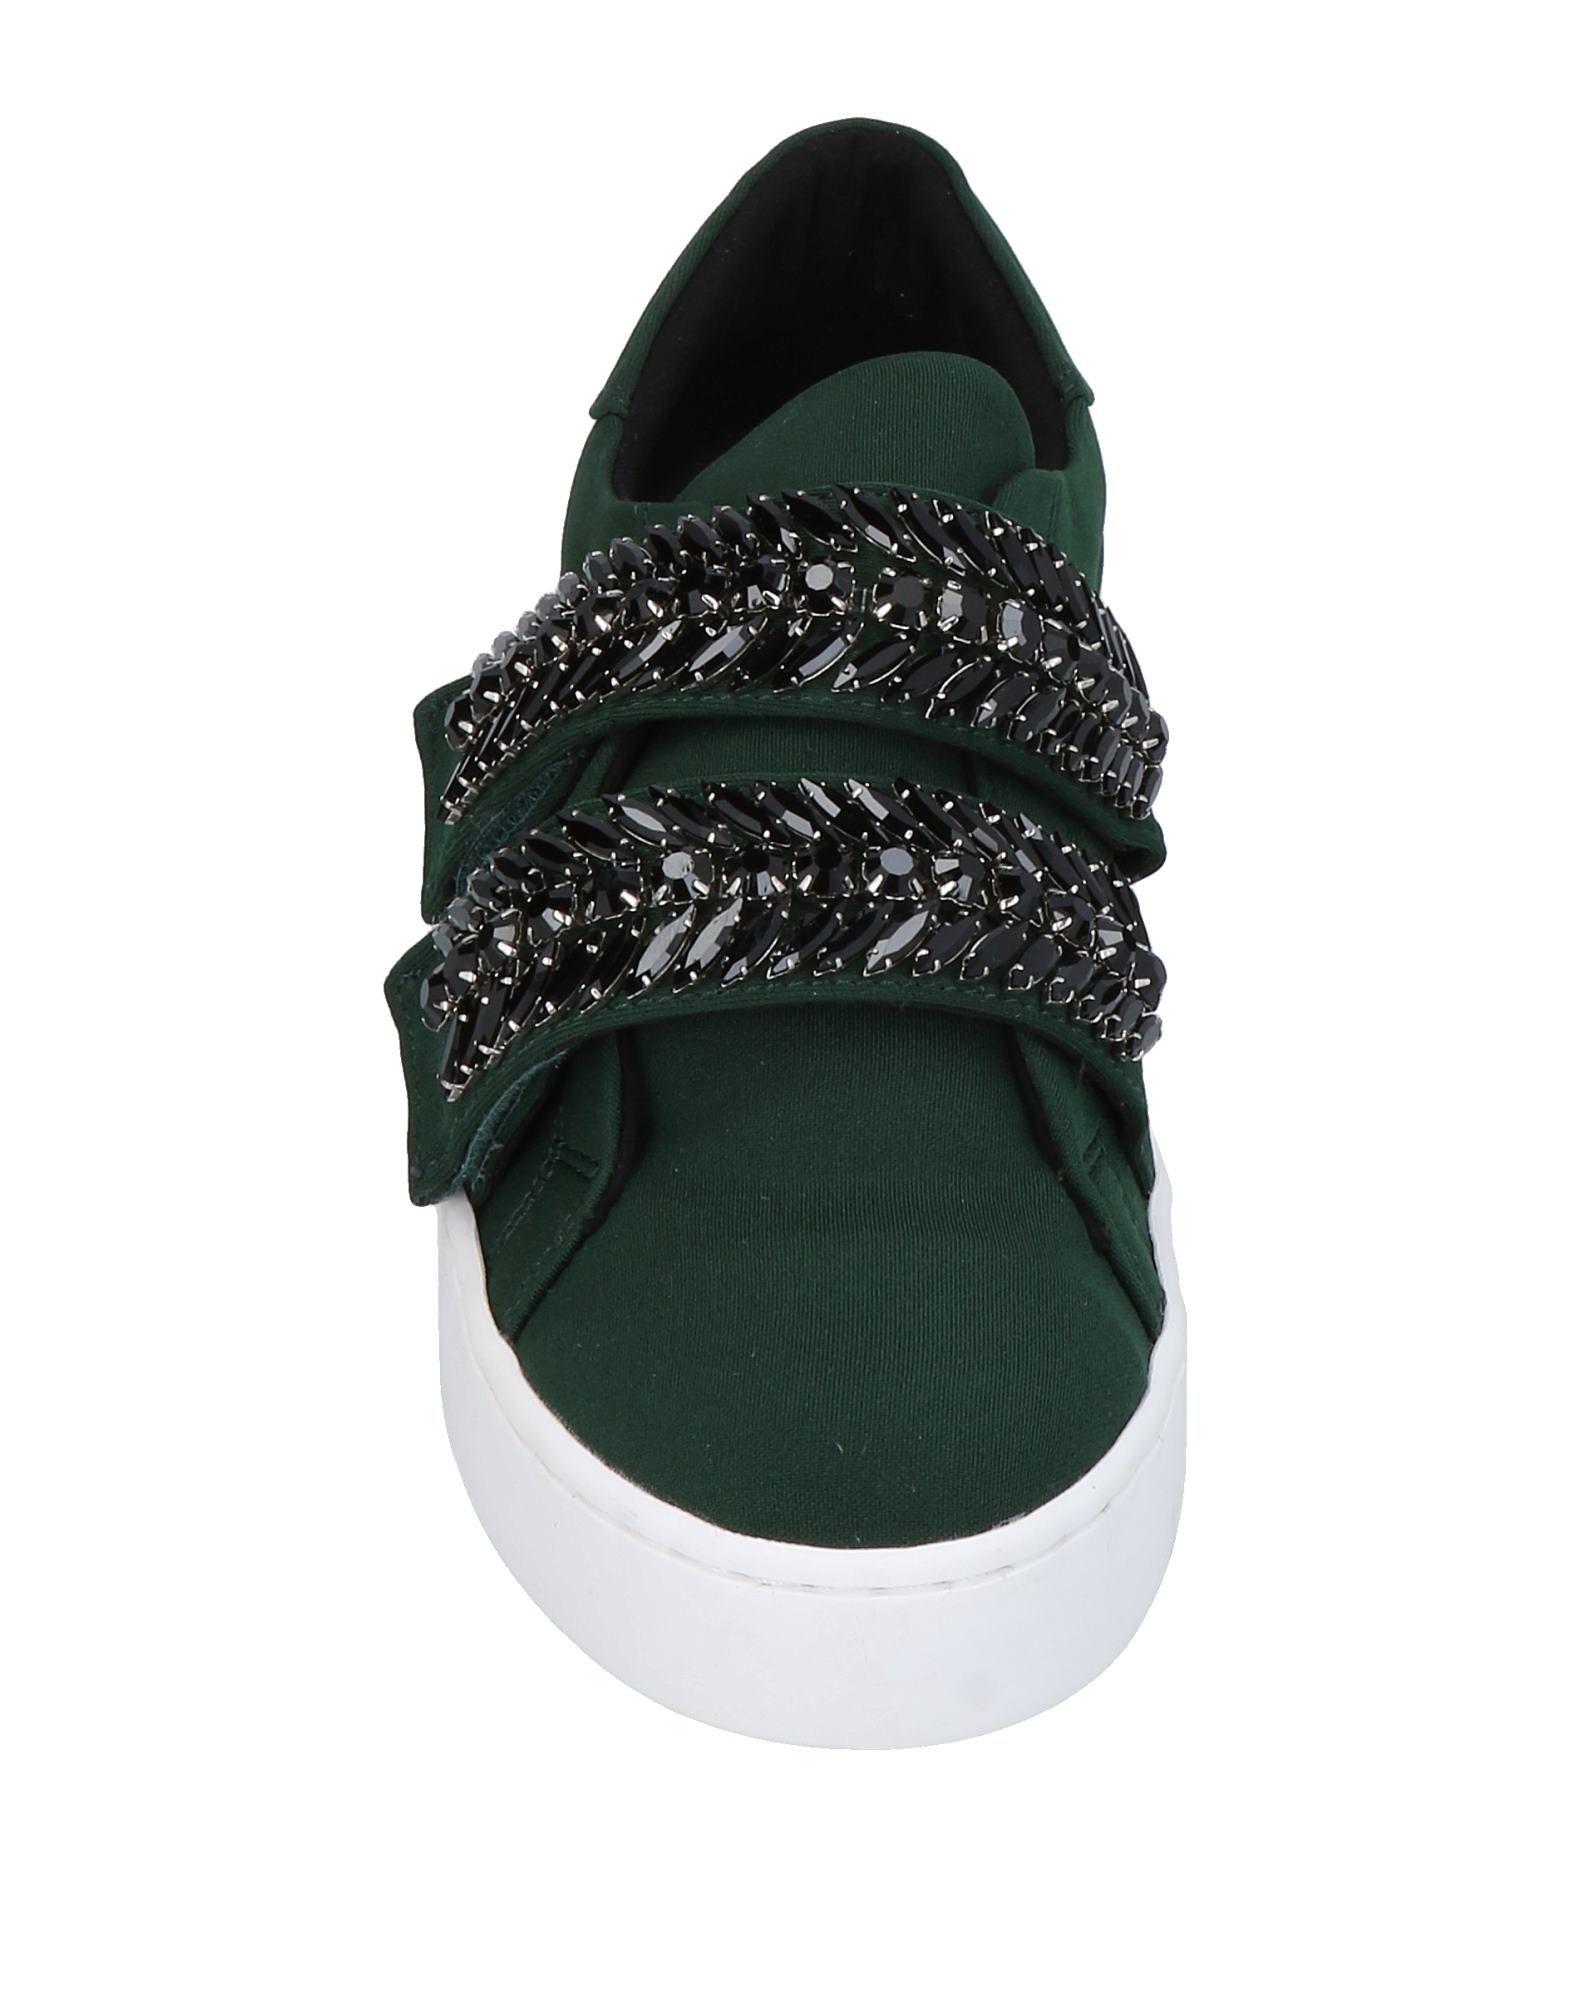 Stilvolle billige Schuhe Suecomma Bonnie 11453183JF Sneakers Damen  11453183JF Bonnie 2e71b8